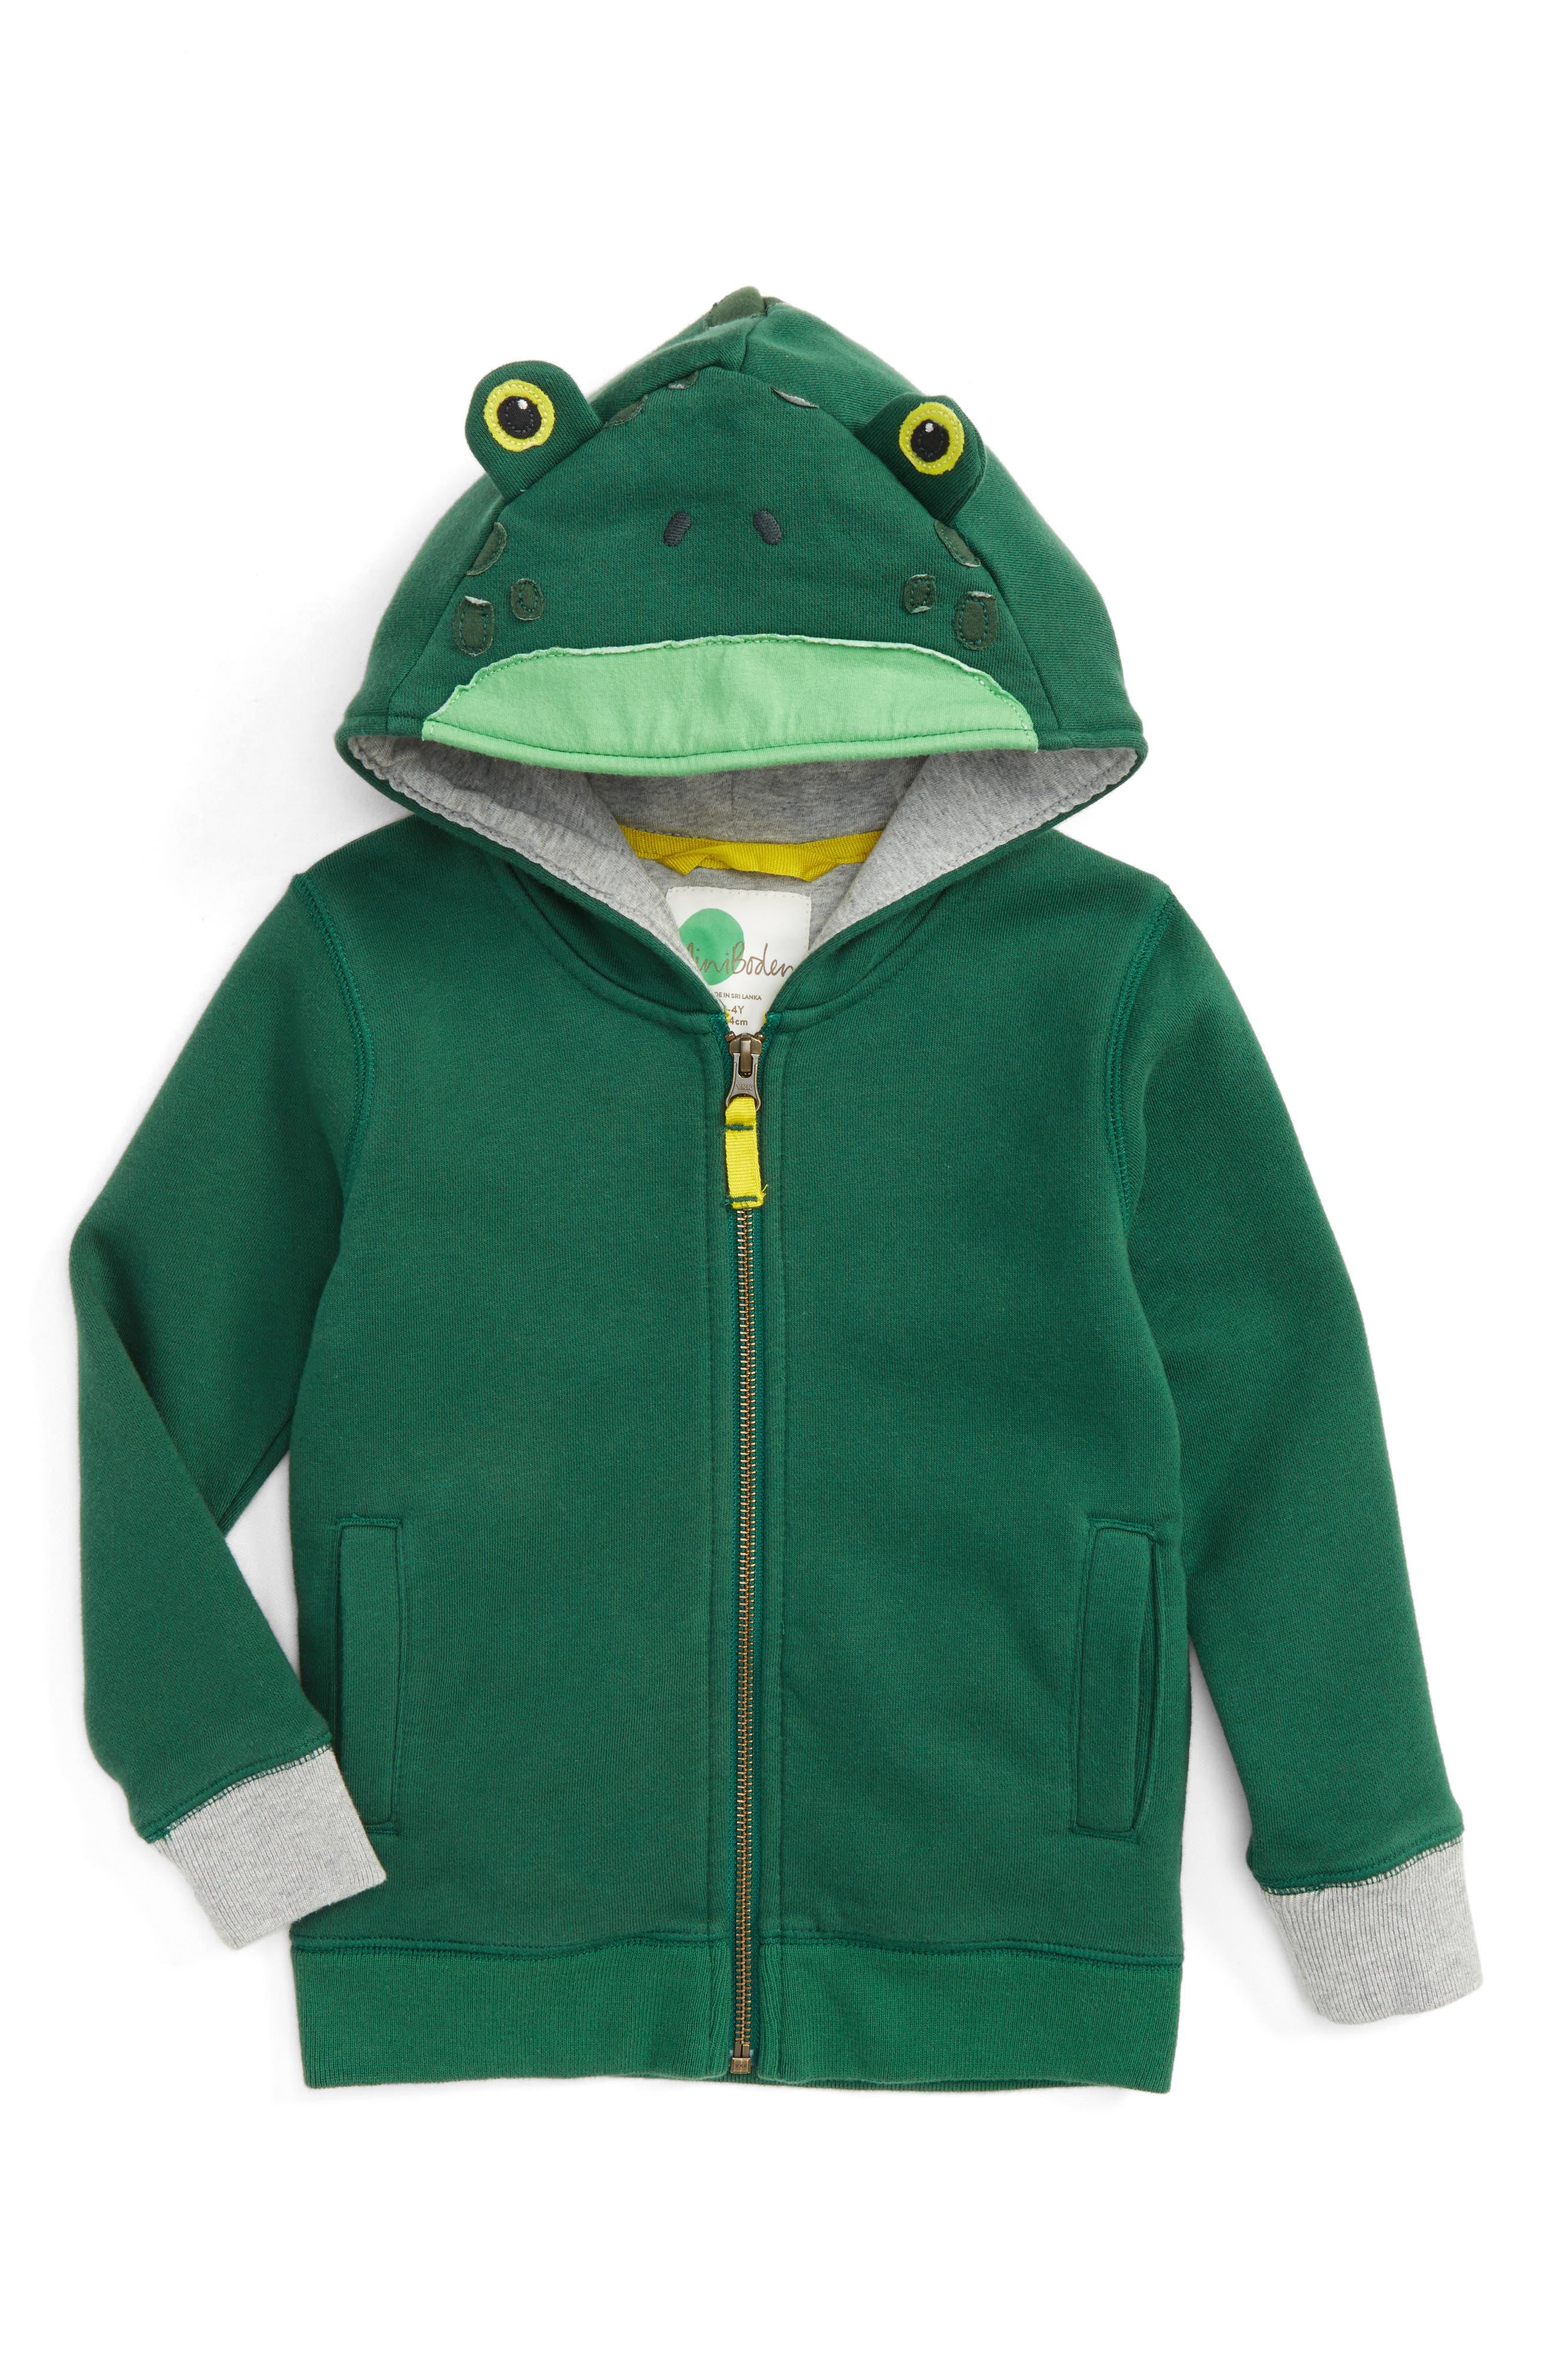 Animal Zip Hoodie,                             Main thumbnail 1, color,                             Timber Green Frog